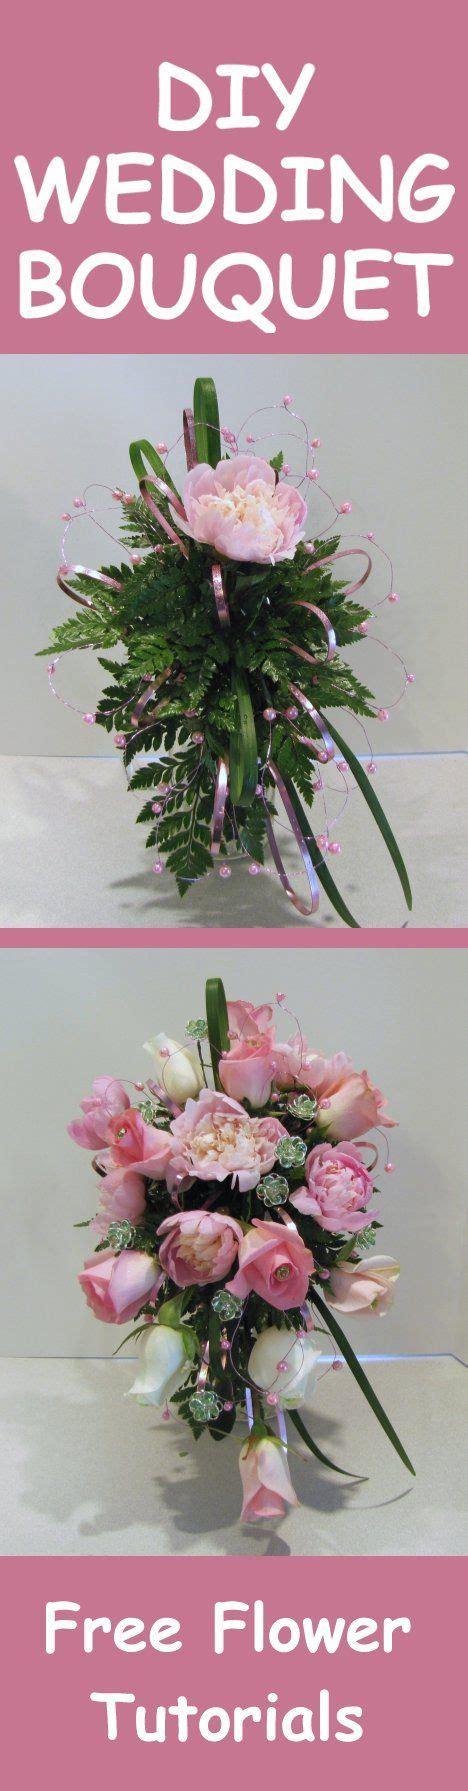 table centerpieces easy diy  wedding  pinterest